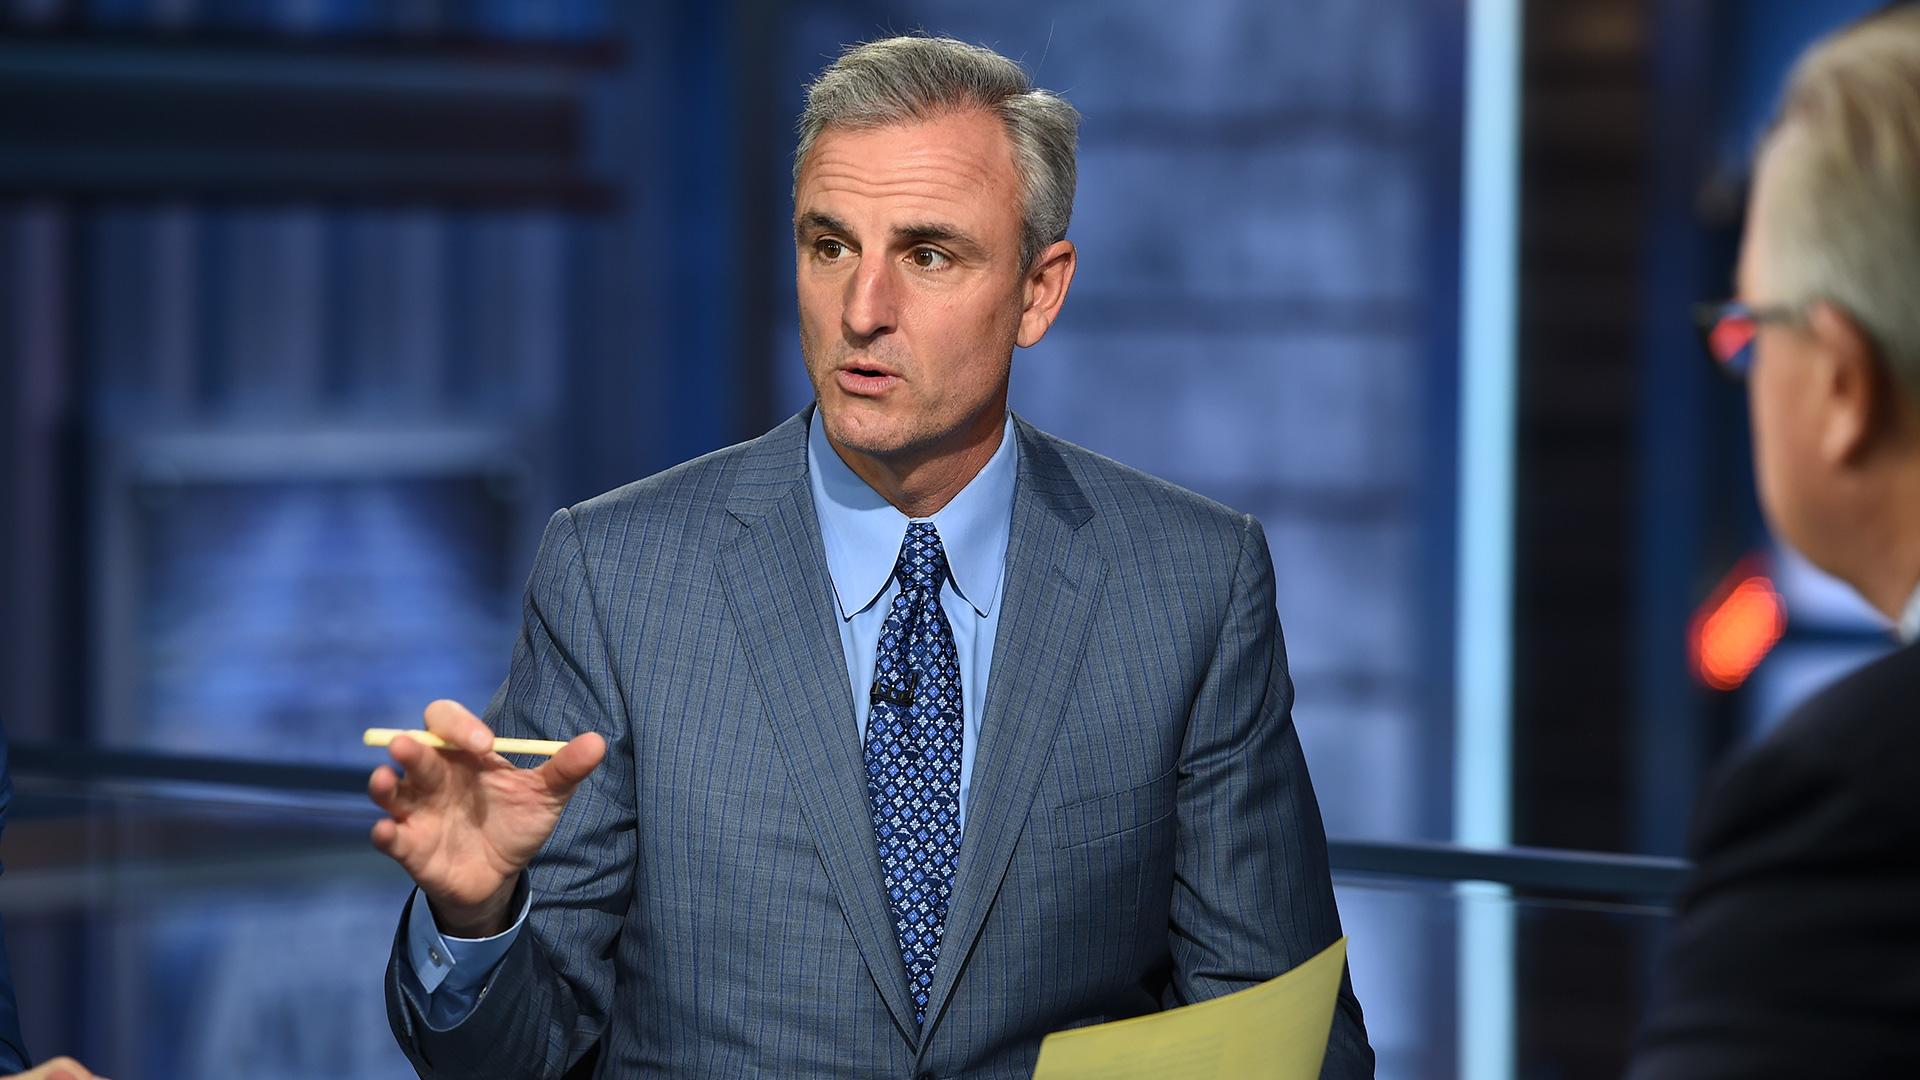 ESPN reshuffling leaves Trey Wingo and Wendi Nix in 'limbo,' report says